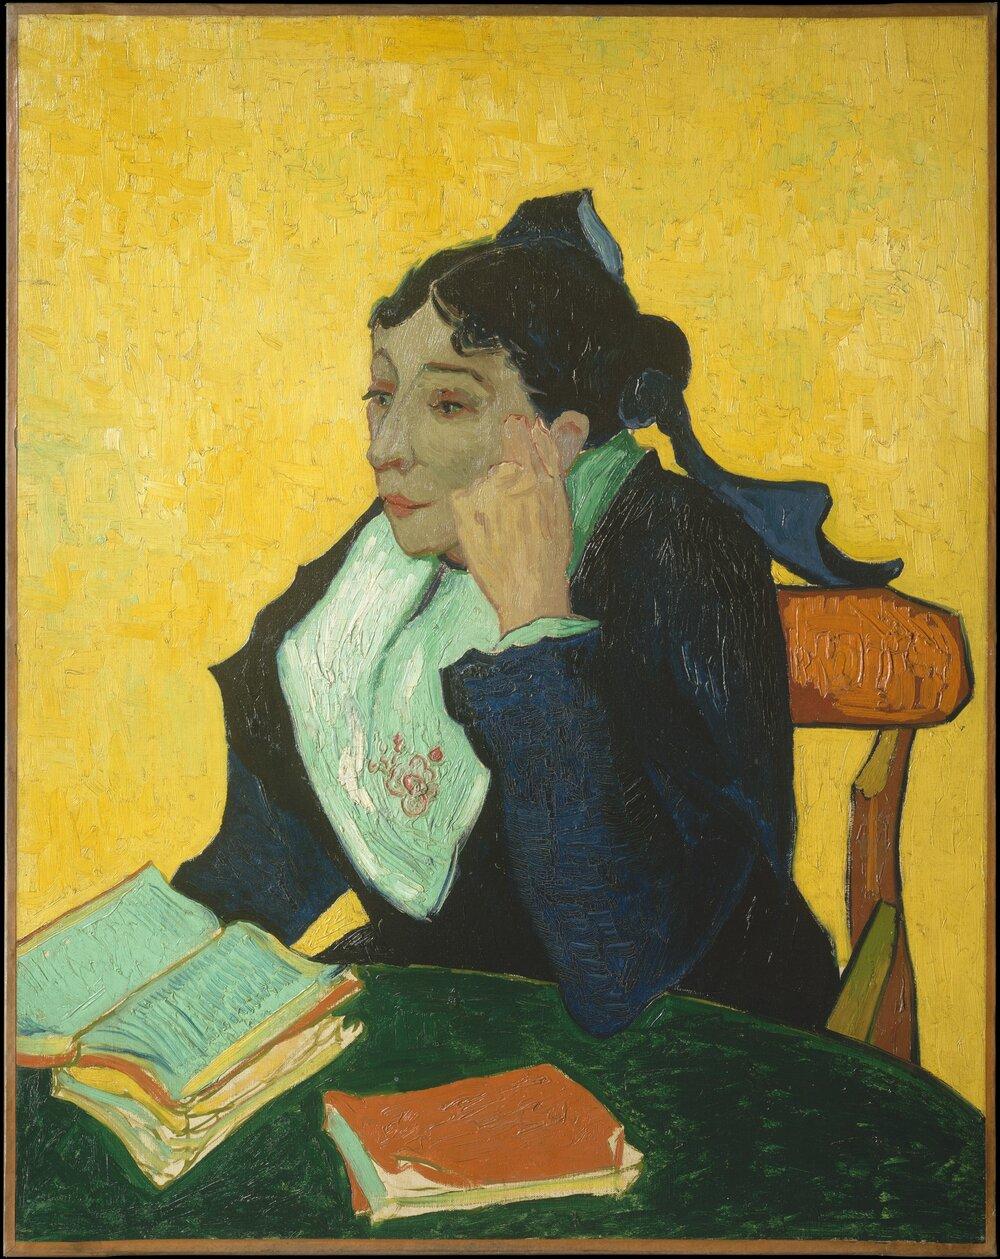 Вінсент ван Гог, L'Arlésienne: Madame Joseph-Michel Ginoux 1888–1889